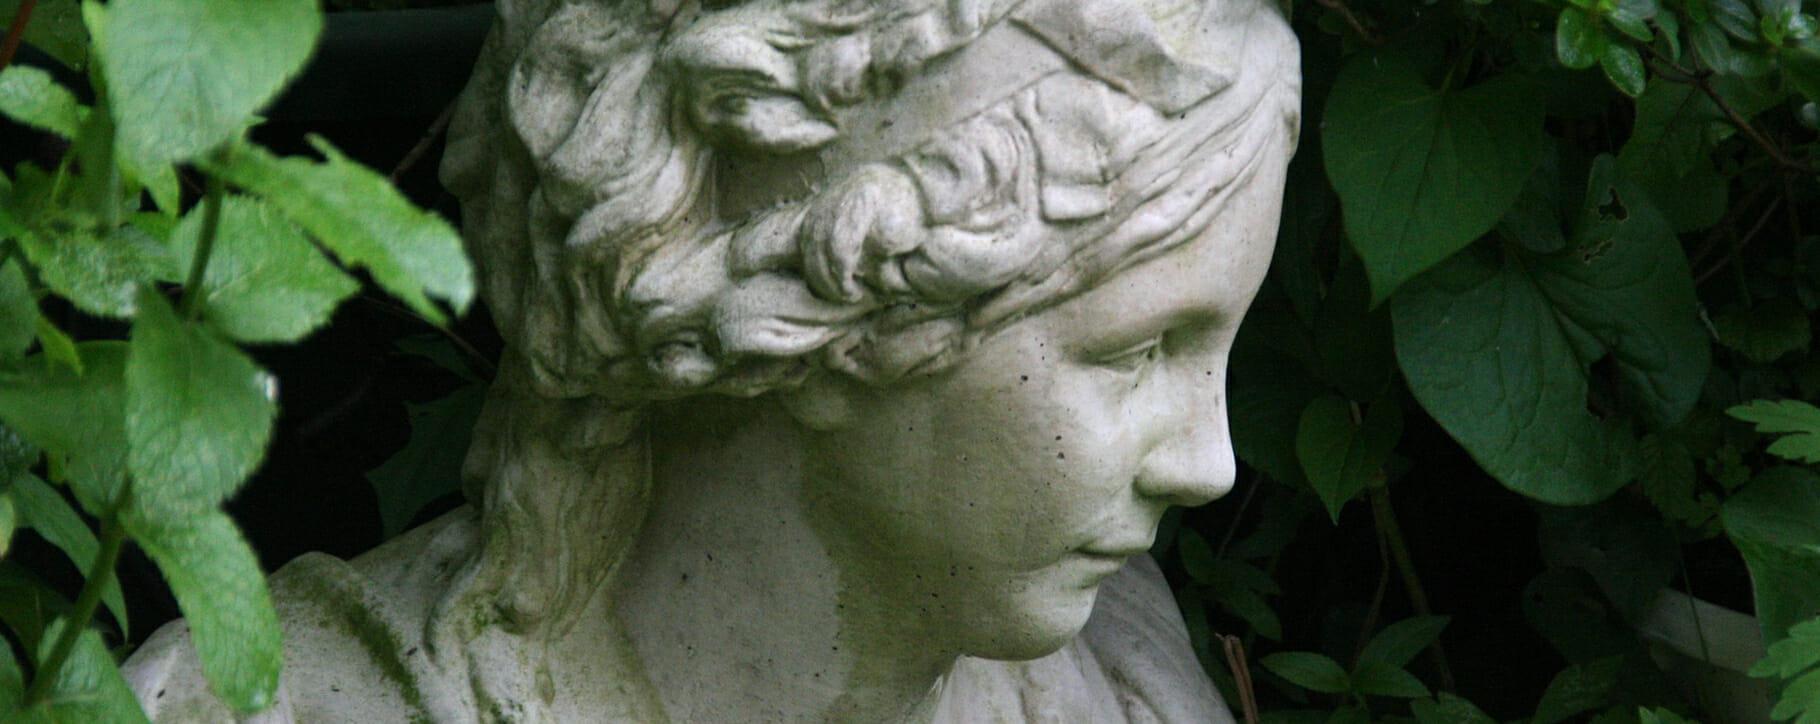 Garden Statue Leaves